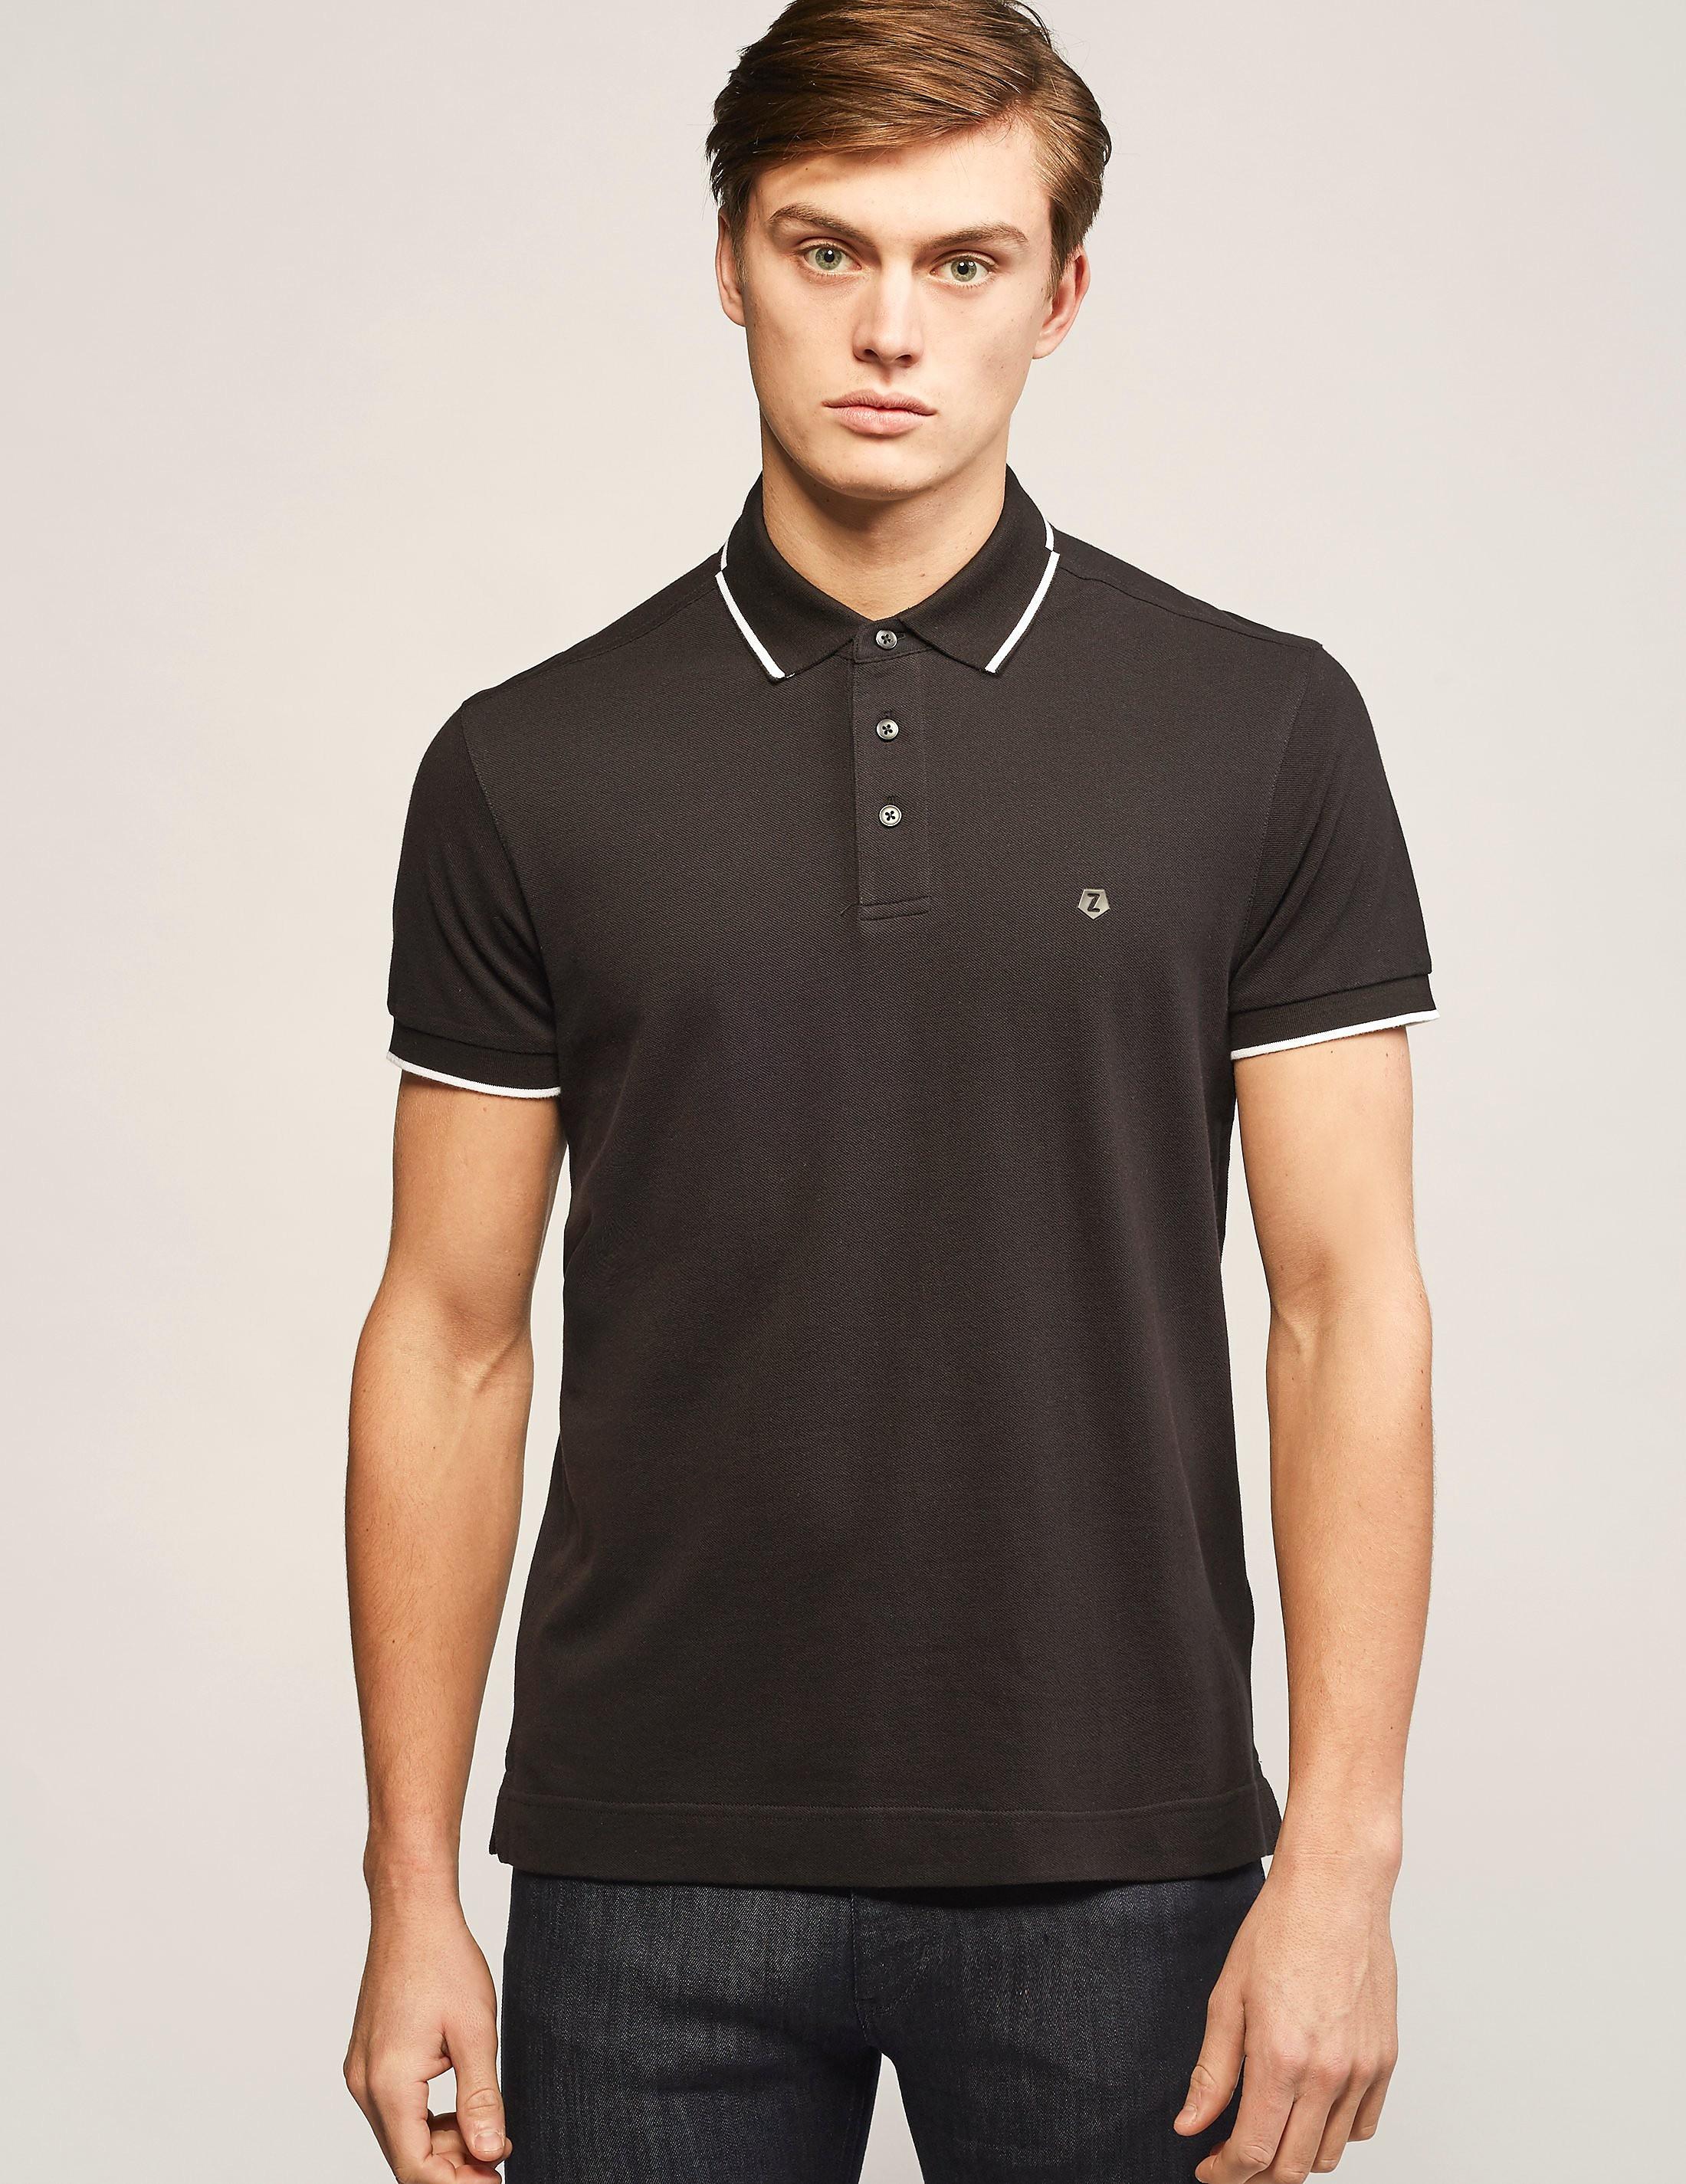 Z Zegna Basic Polo Shirt